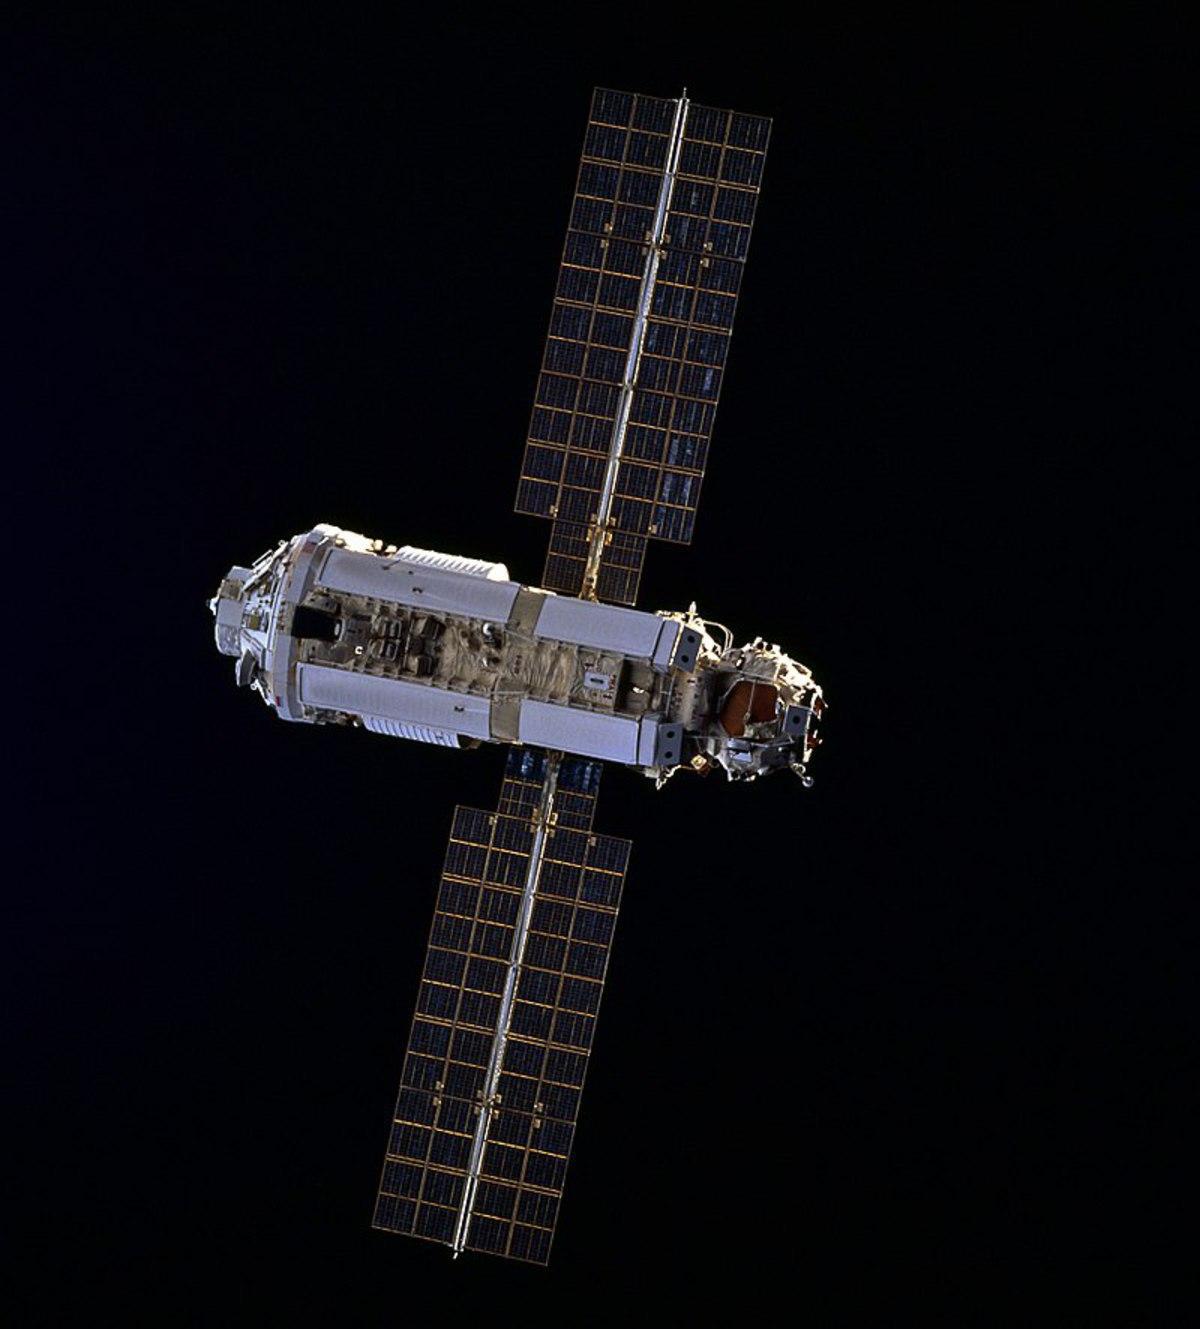 На МКС протестируют космическую жвачку